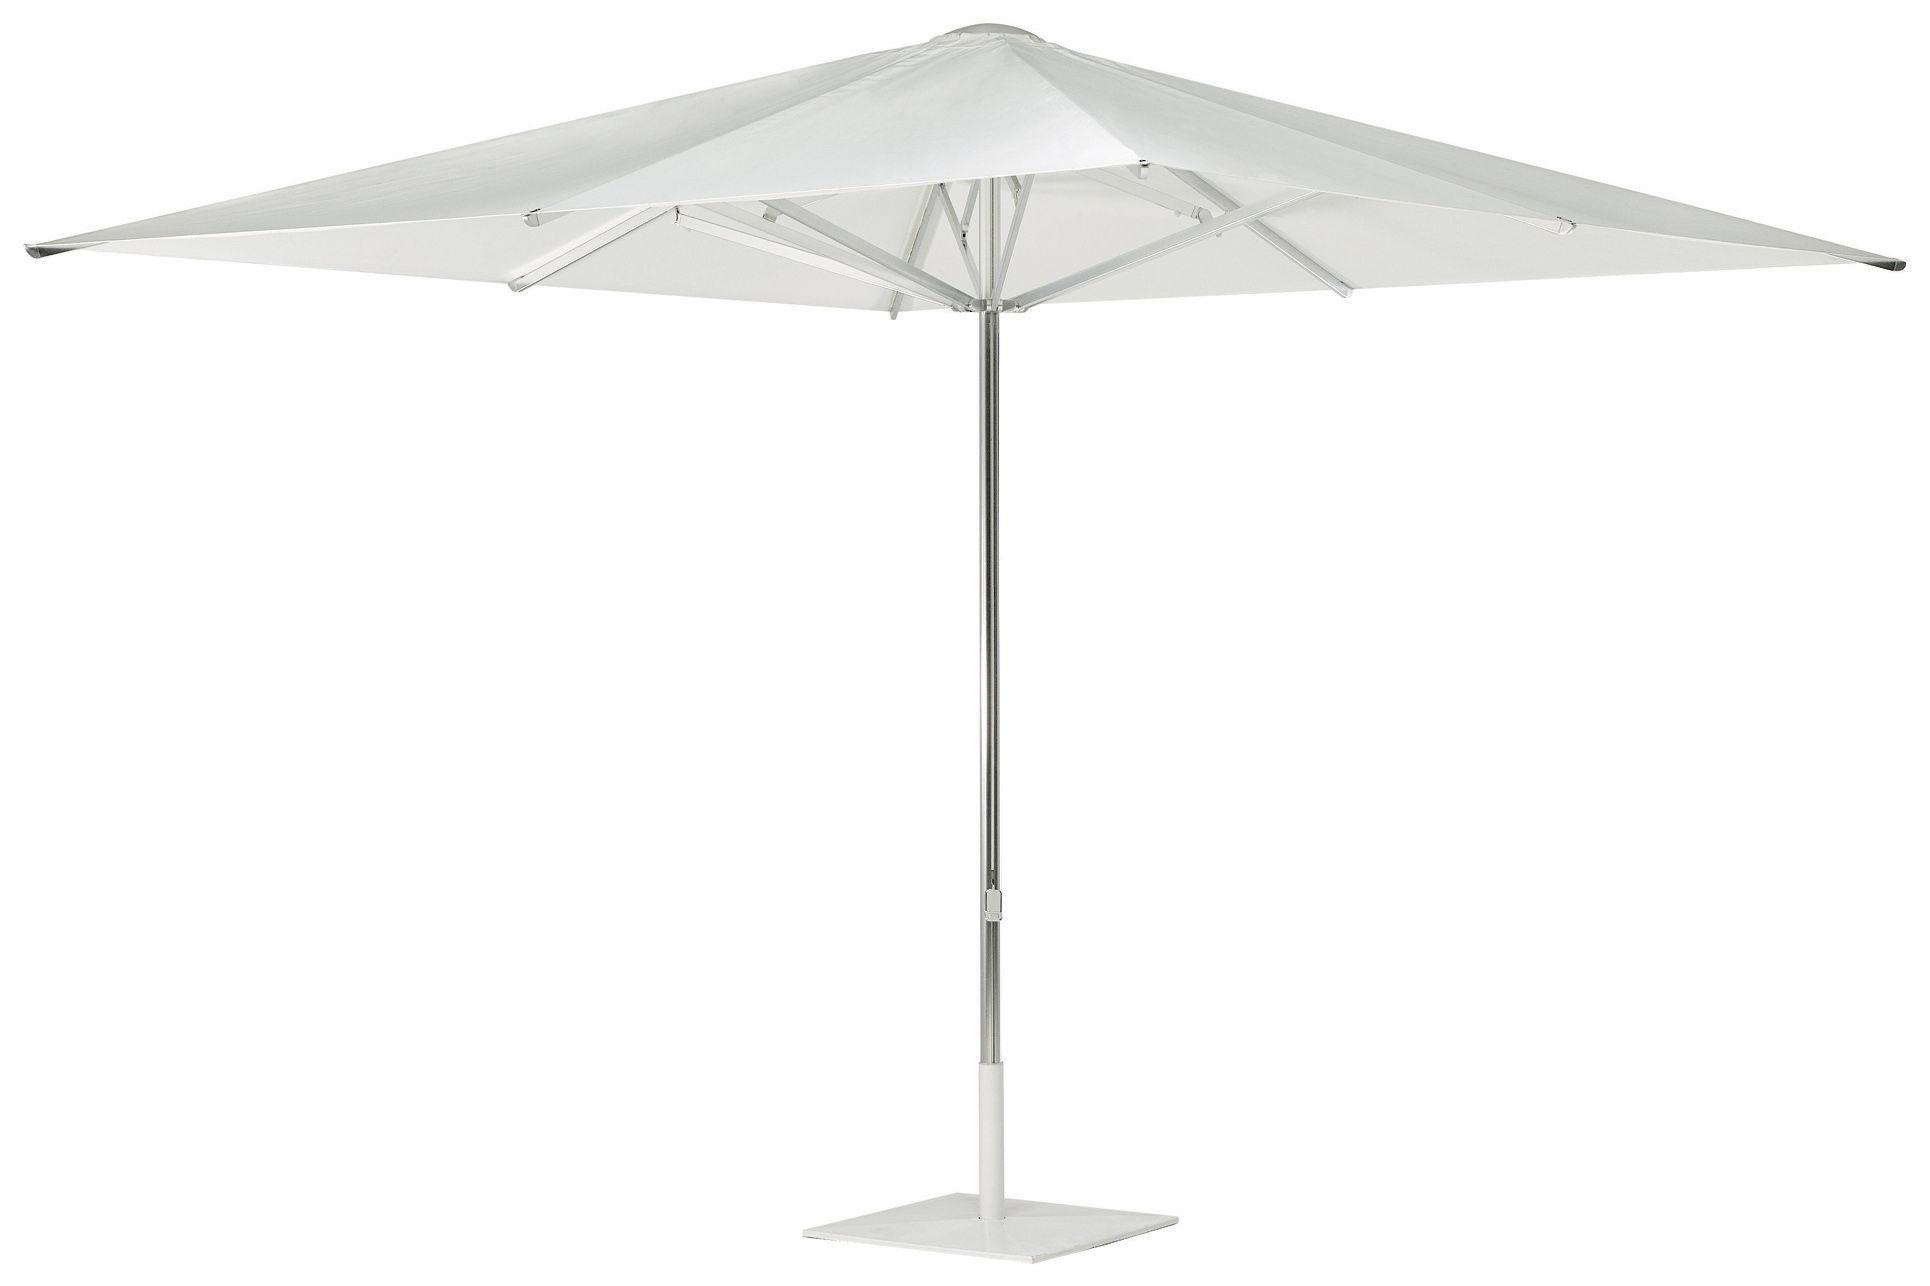 Outdoor - Parasols - Parasol Shade / Pied central - 300 x 300 cm - Emu - Toile blanche / Pied alu / Base blanche - Métal, Toile acrylique